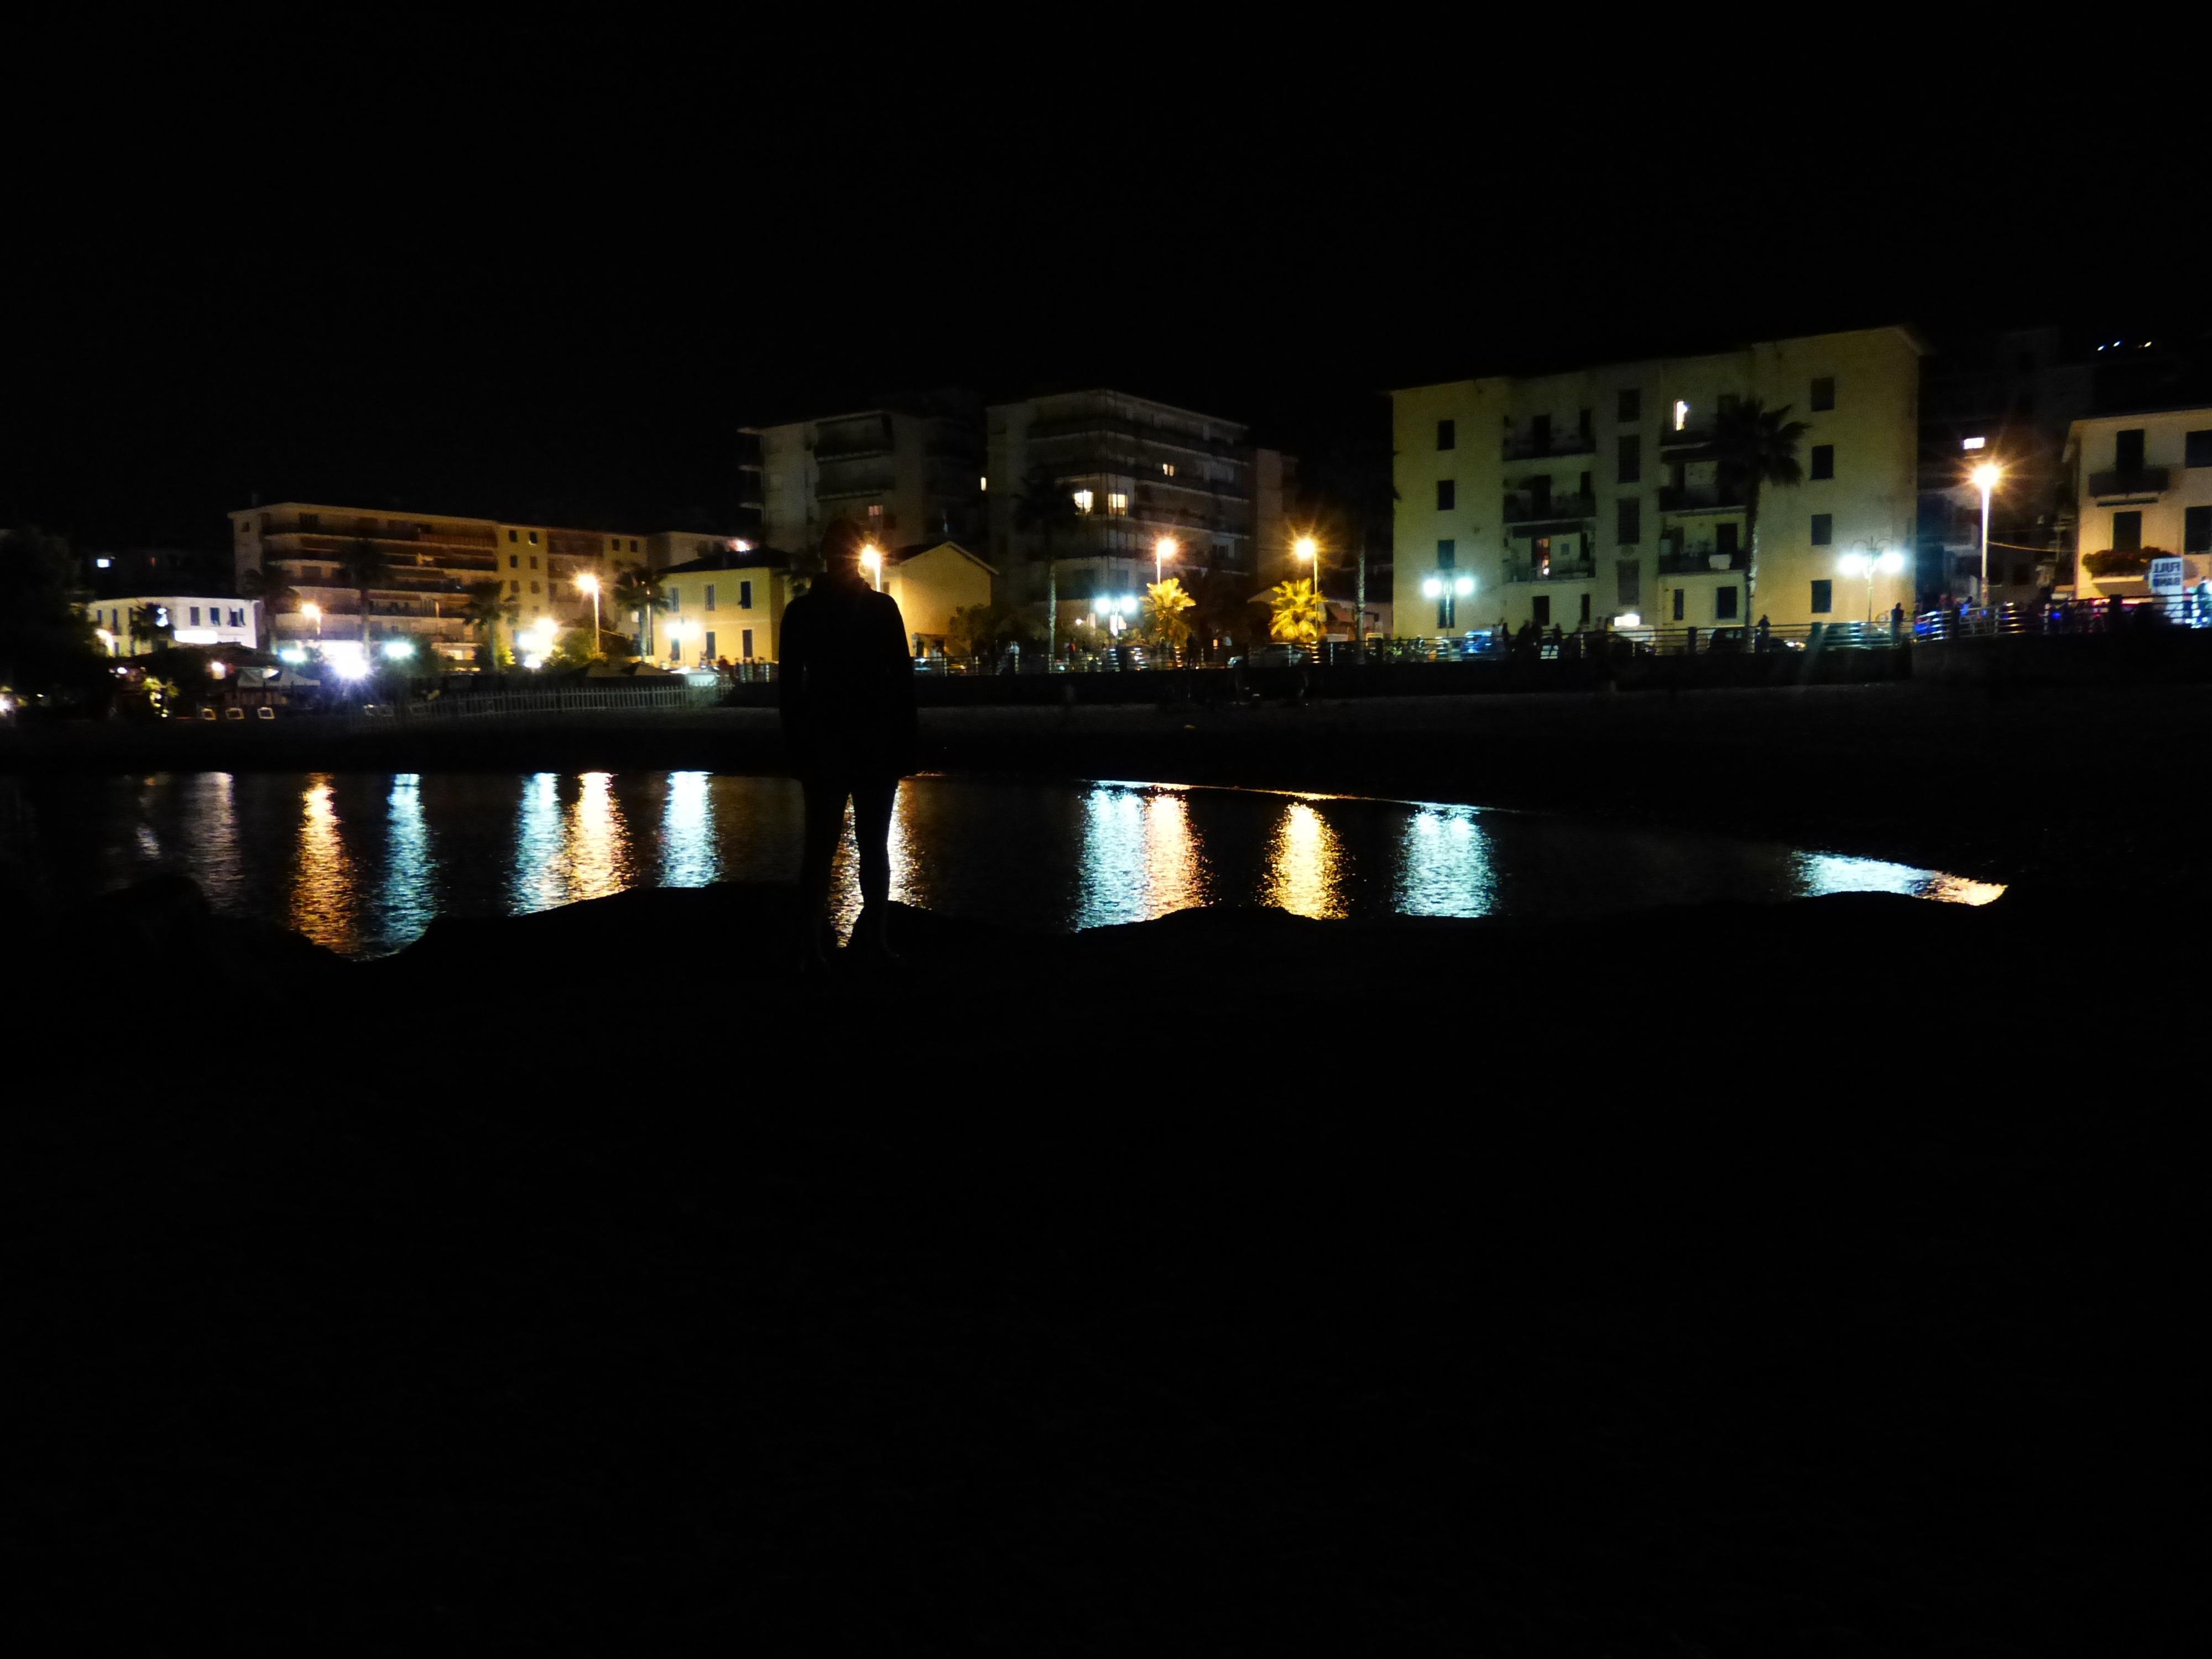 Beach Light Skyline Night Cityscape Dusk Evening Reflection Darkness Lighting At Lights Bank Reflections Sea